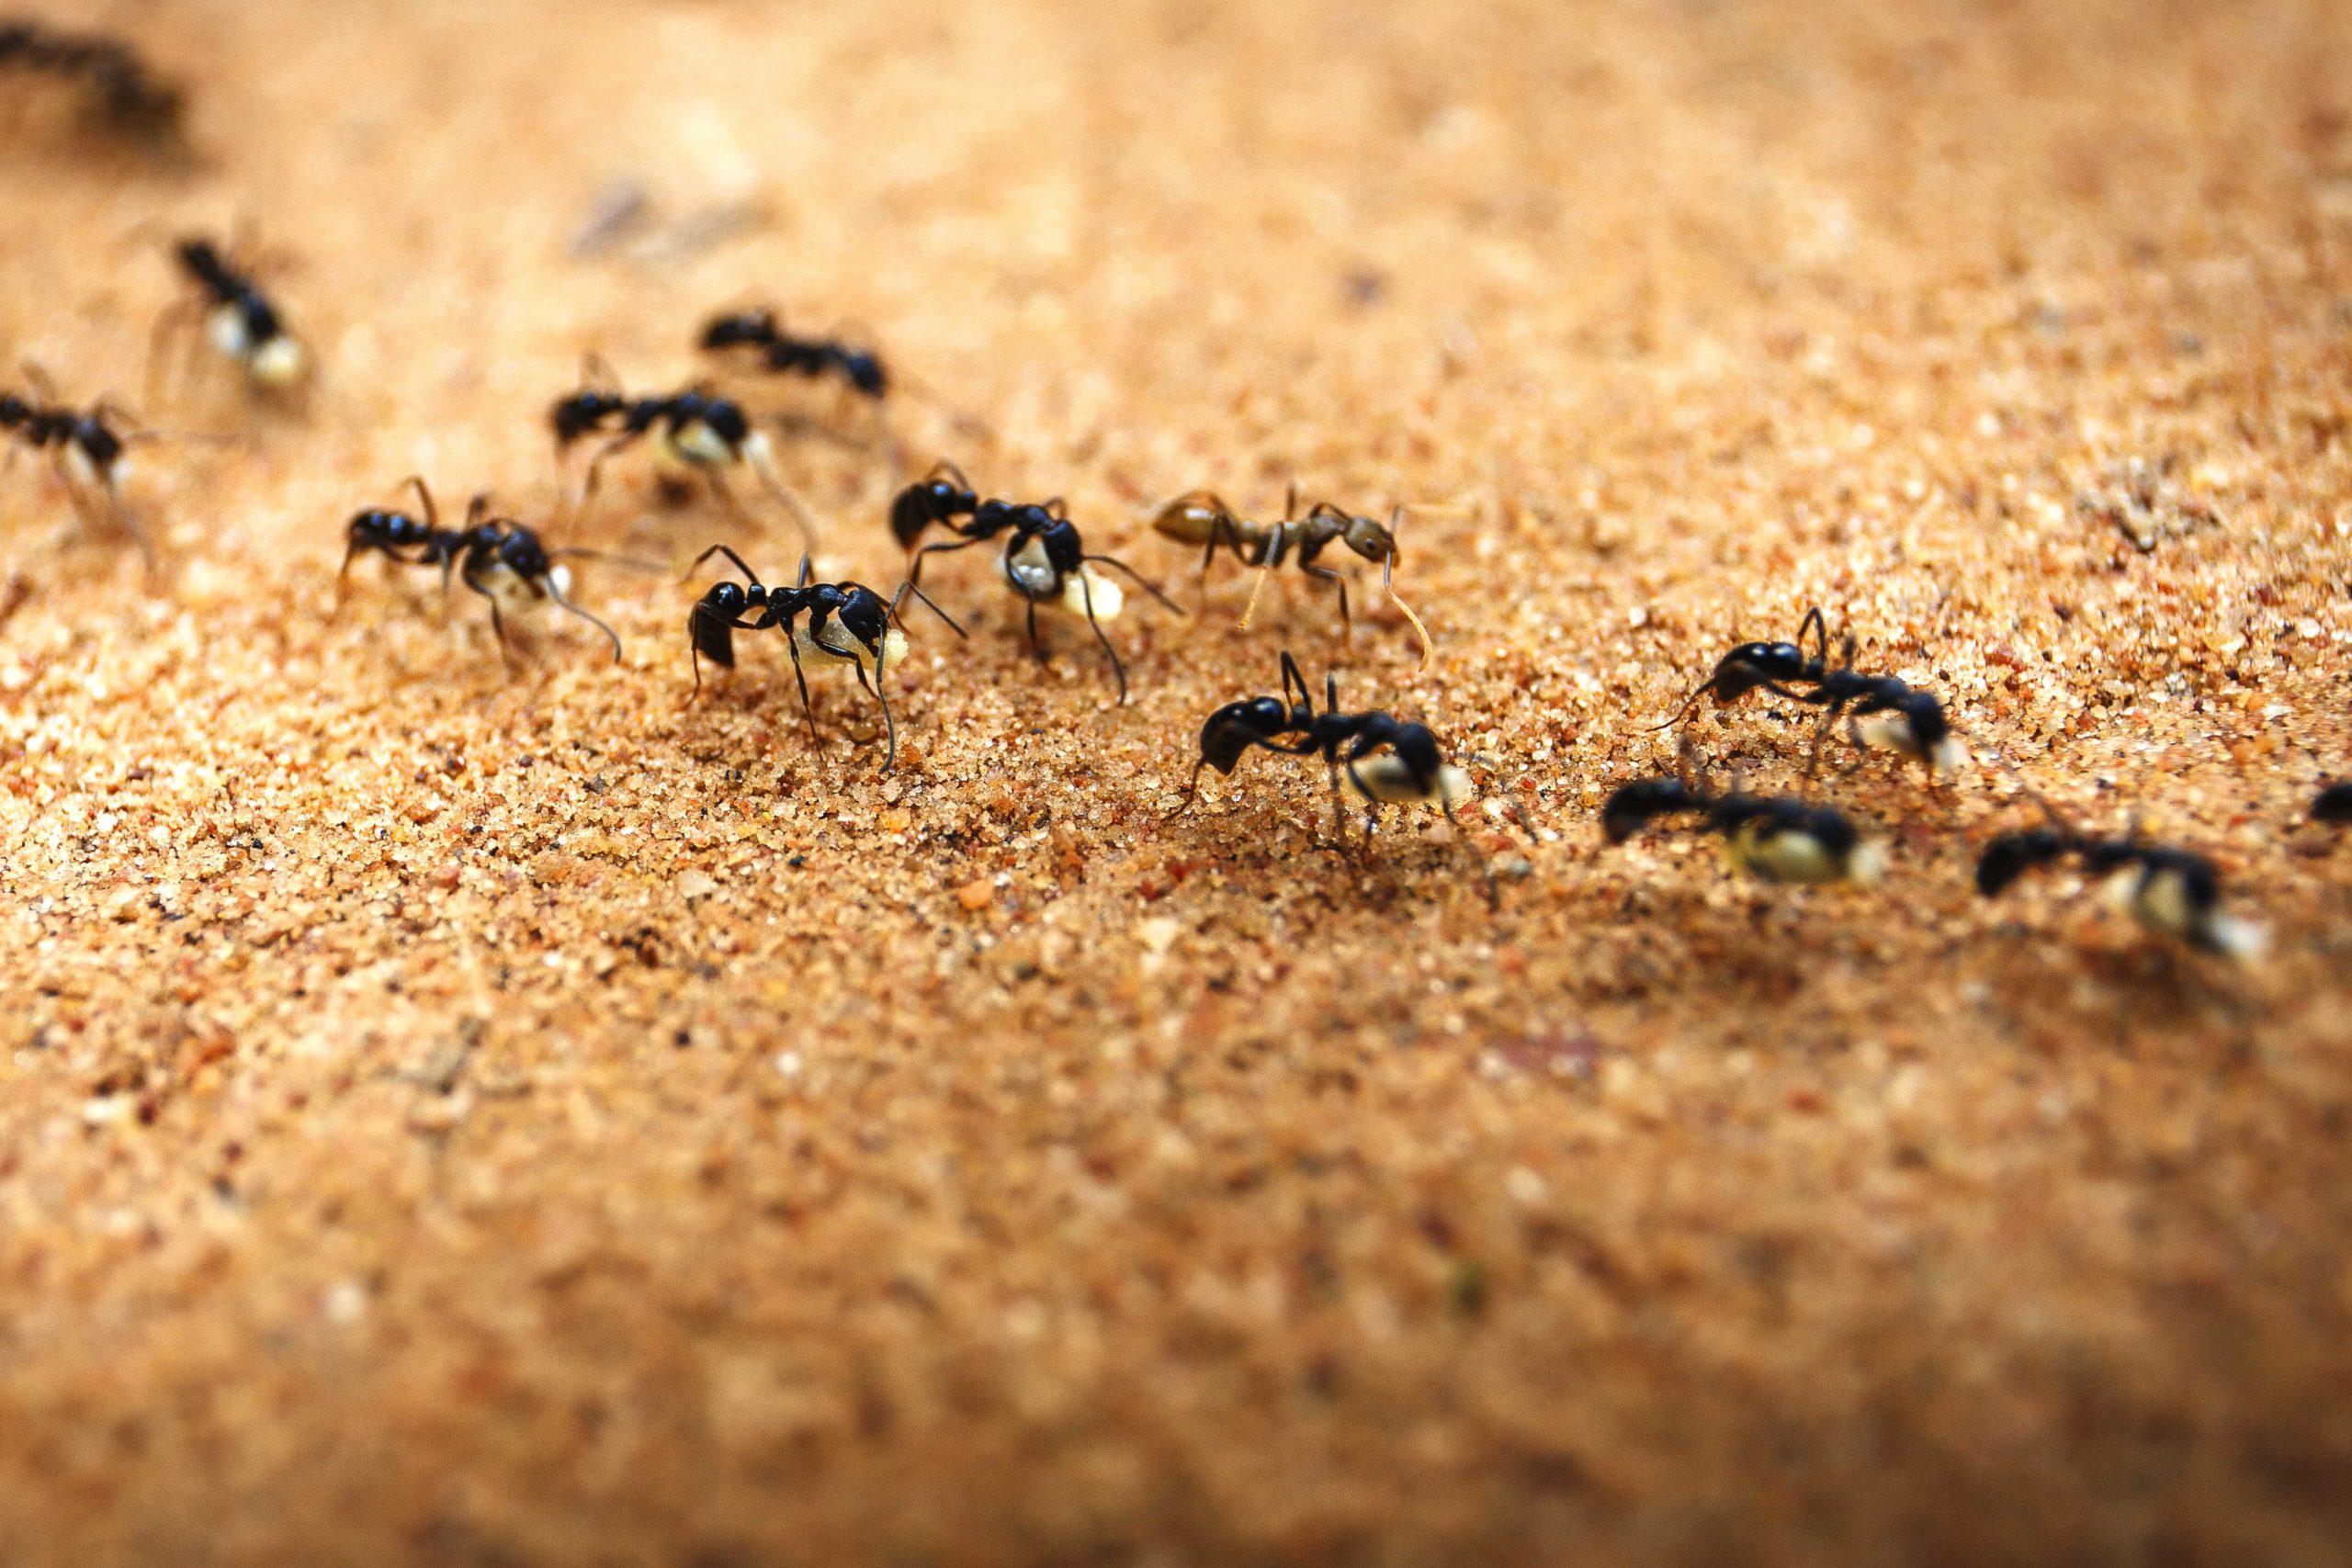 Почему муравьи ходят по цепочке друг за другом?